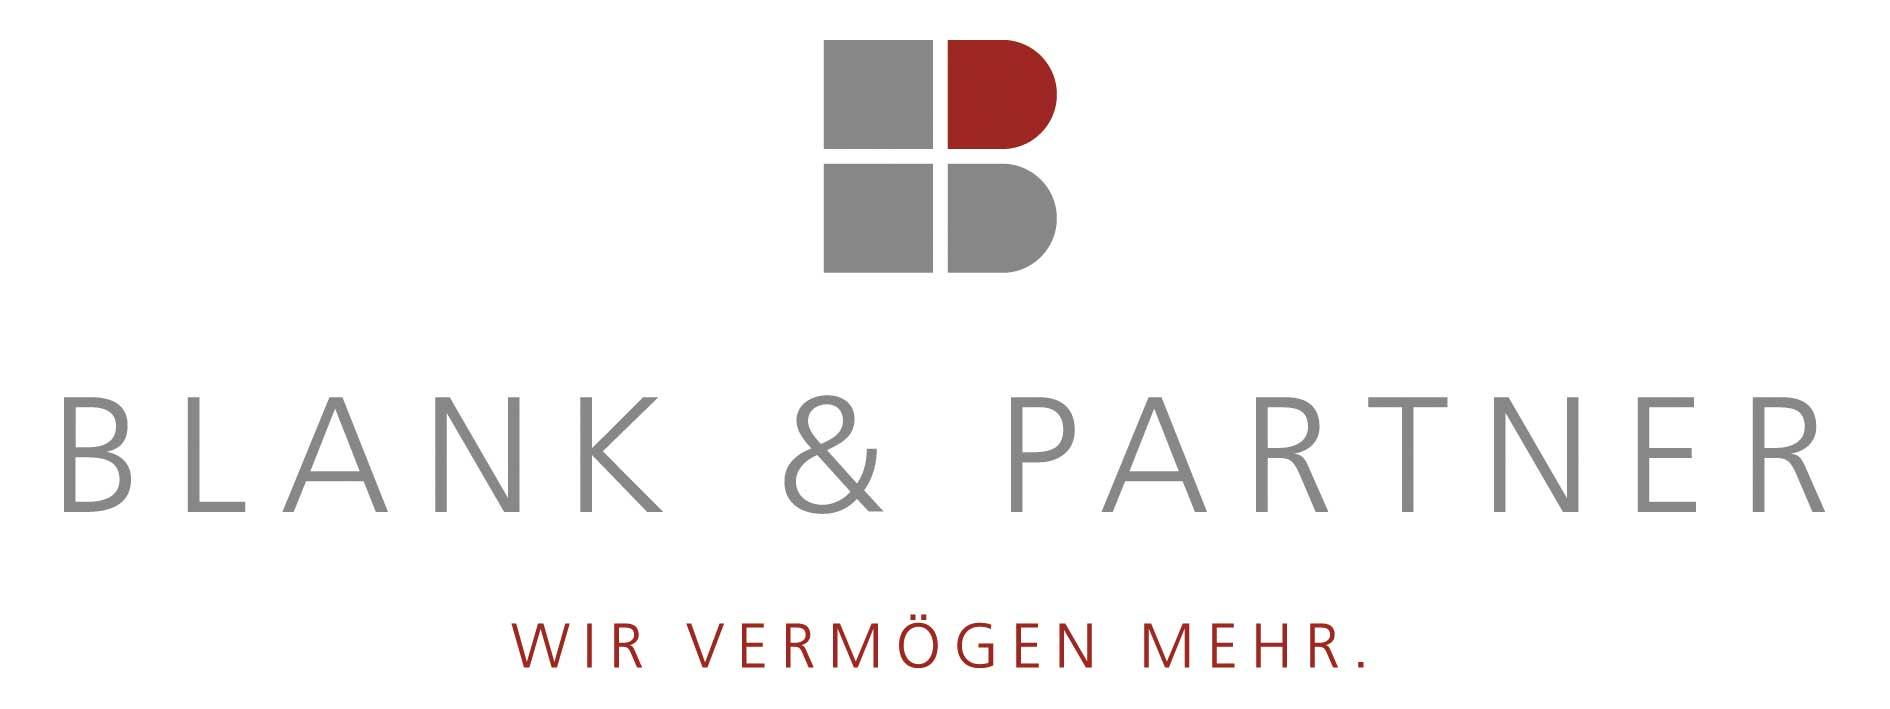 Blank & Partner